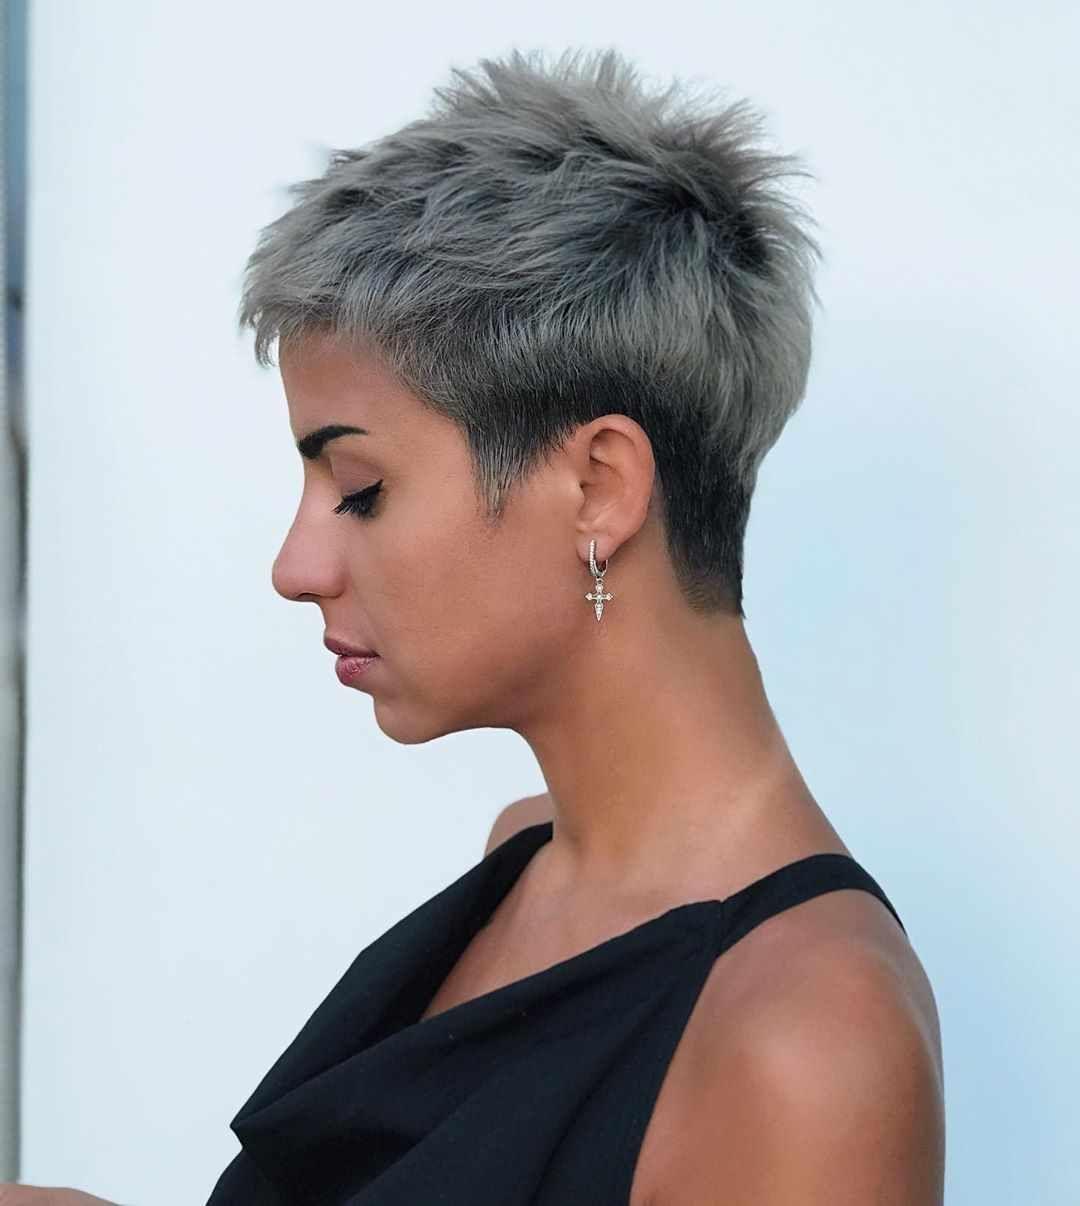 50 Latest Pixie And Bob Haircuts For Women Cute Hairstyles 2019 Short Hair Styles Short Hair Trends Bobs Haircuts